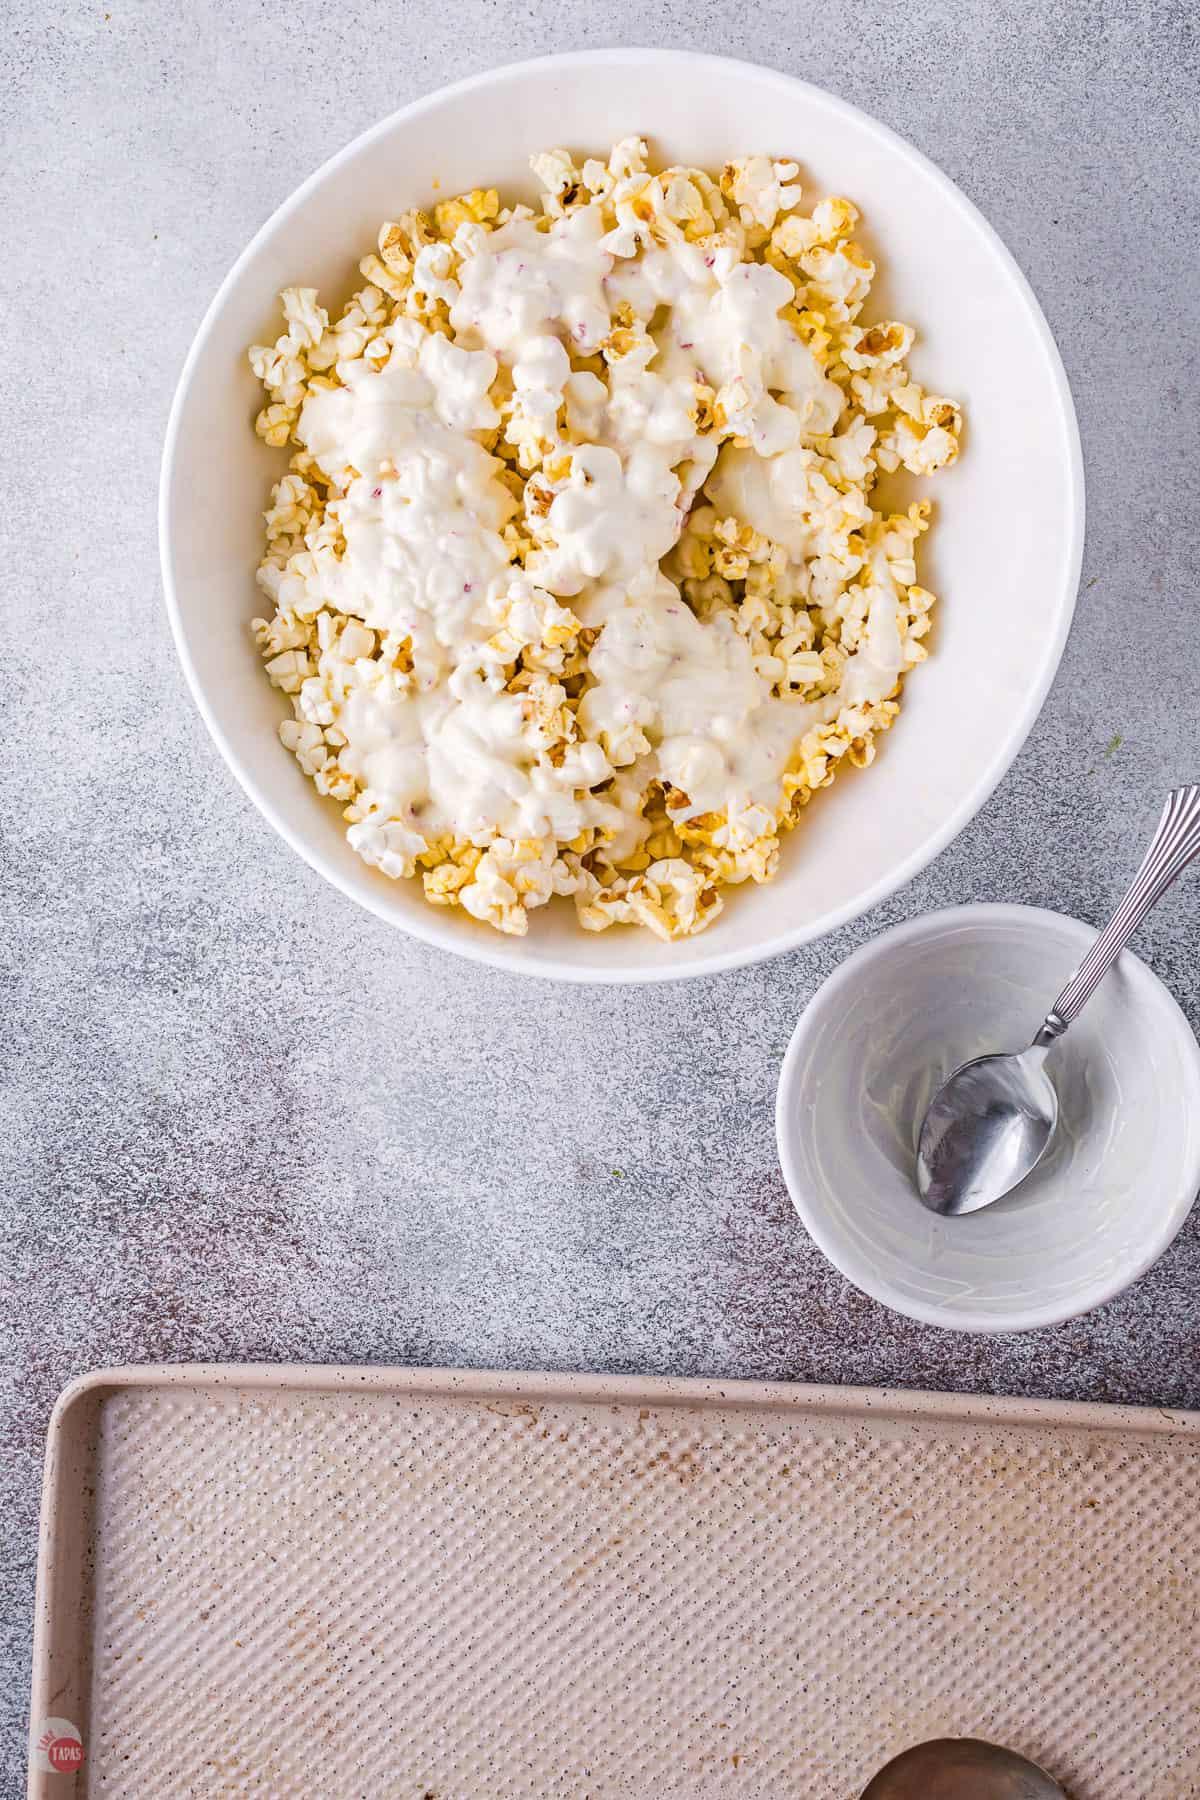 white chocolate on popcorn